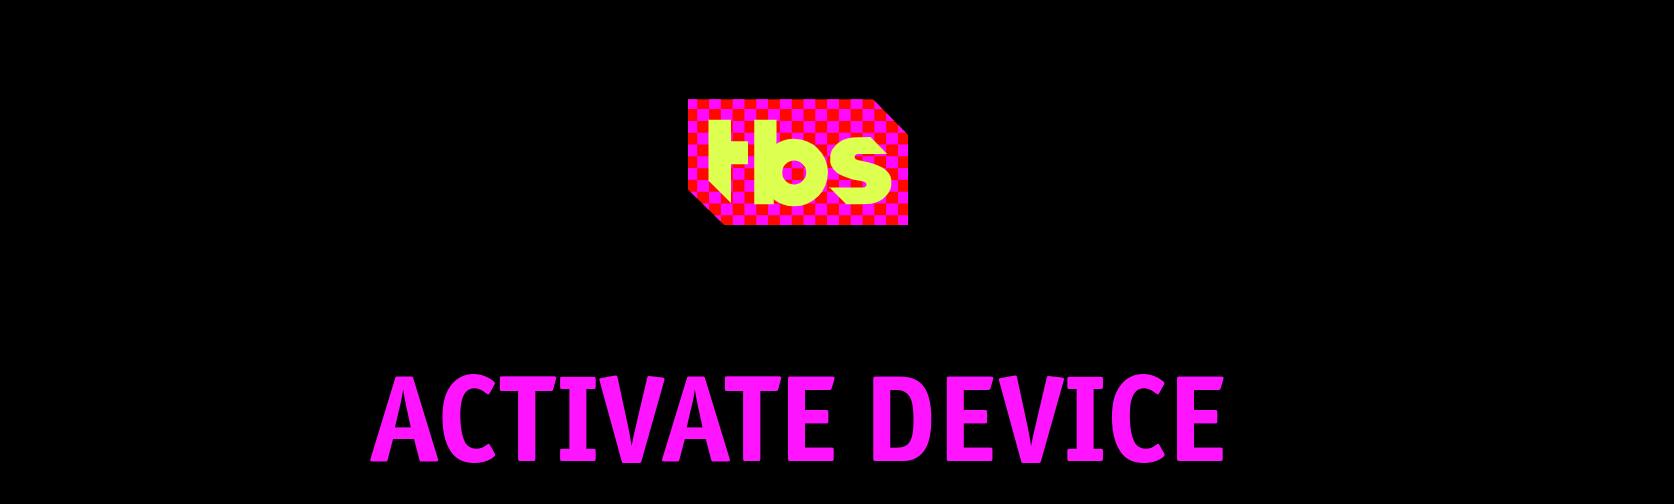 TBS.com/Activate